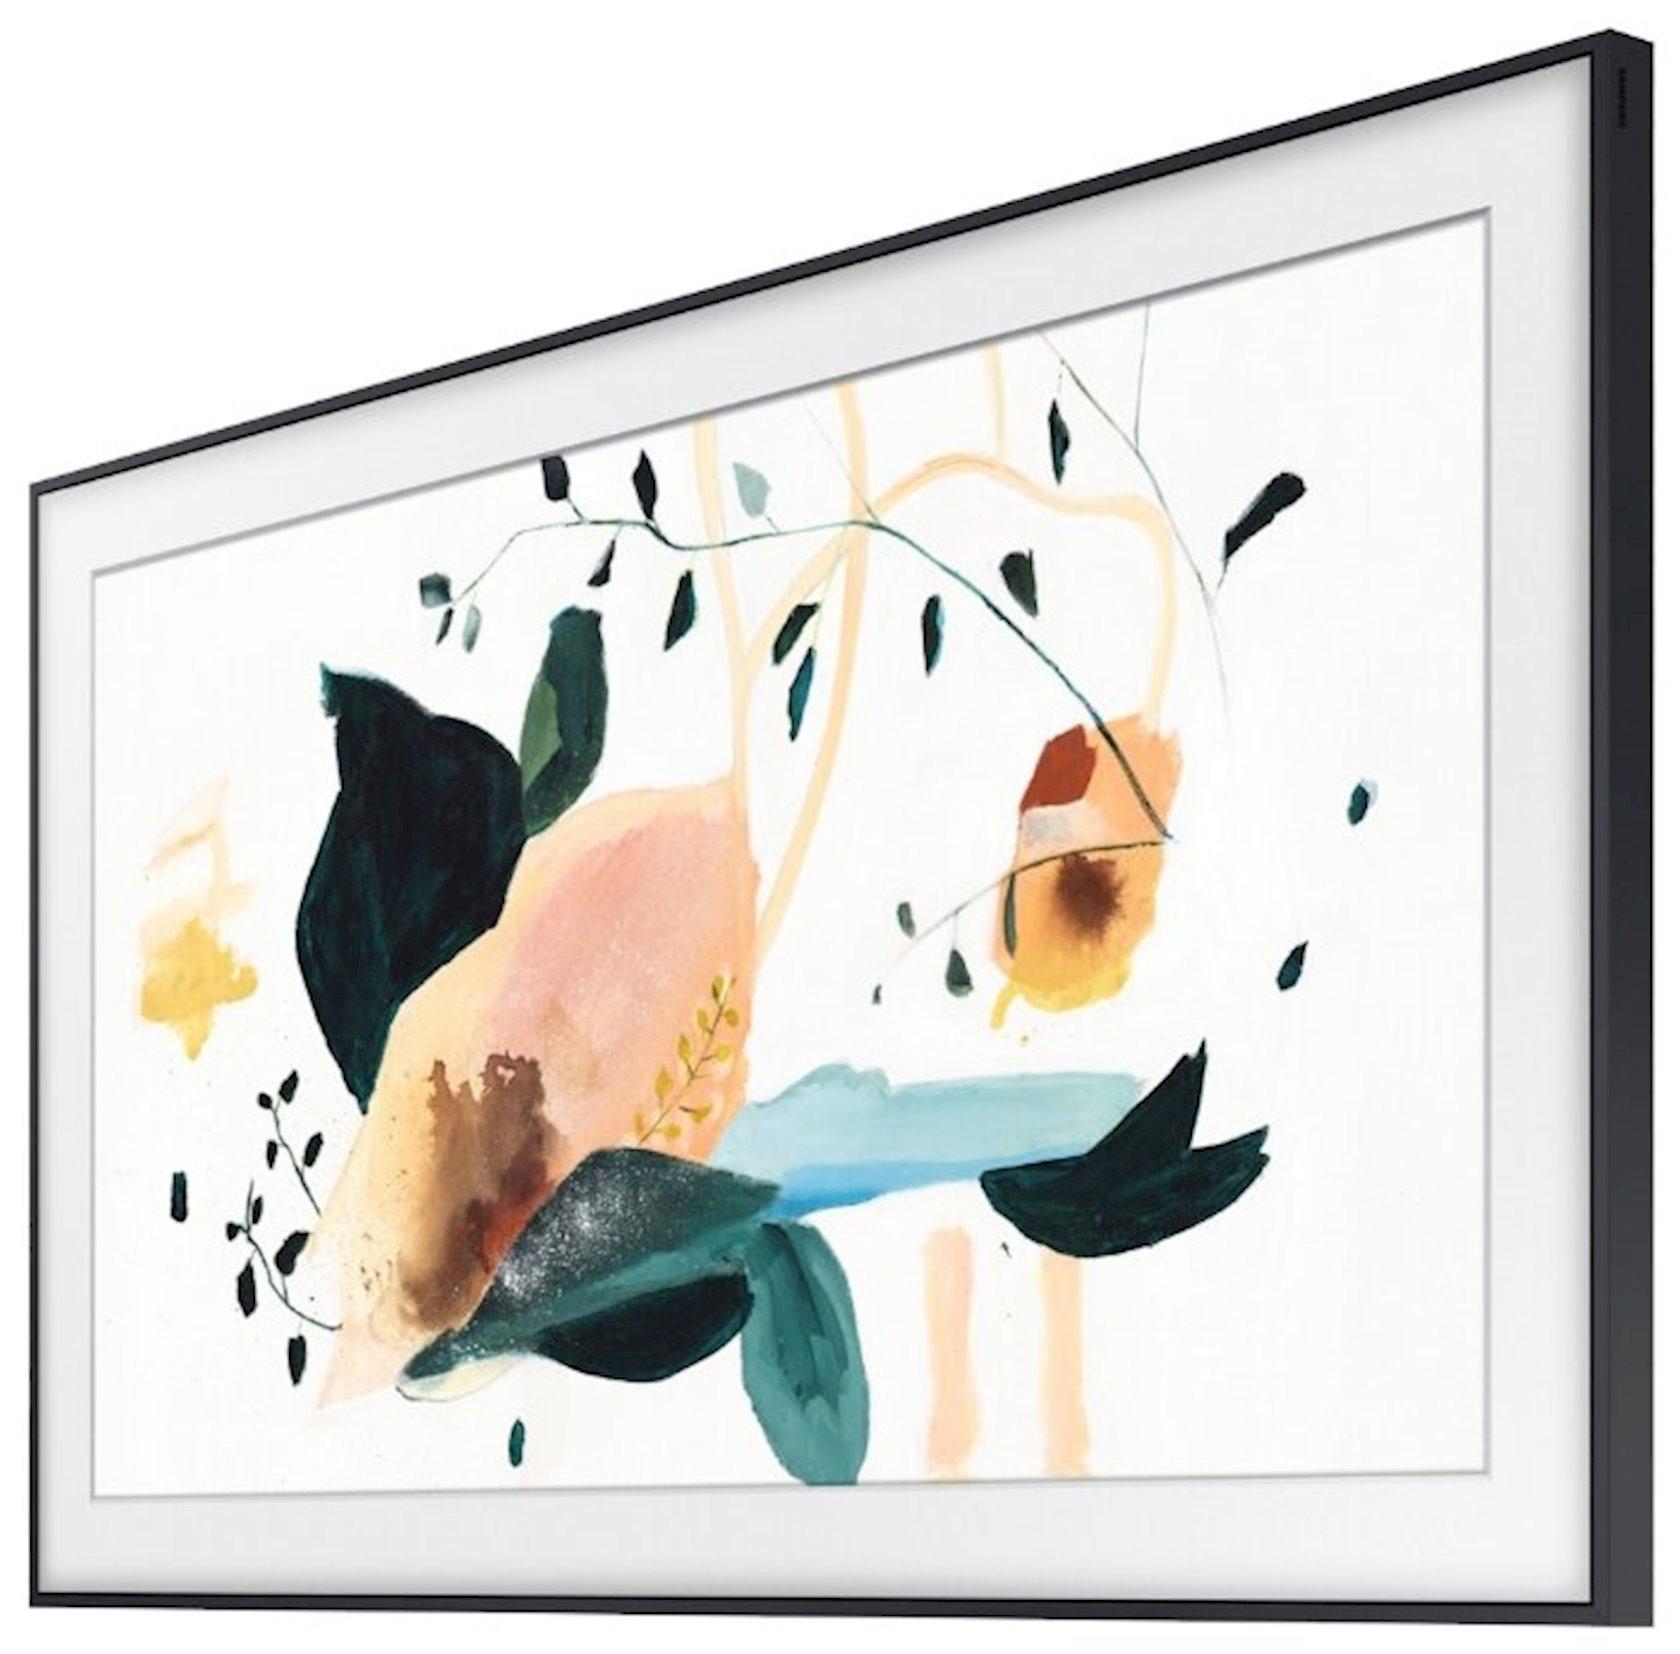 Televizor Samsung The Frame QLED 4K UHD HDR Smart TV